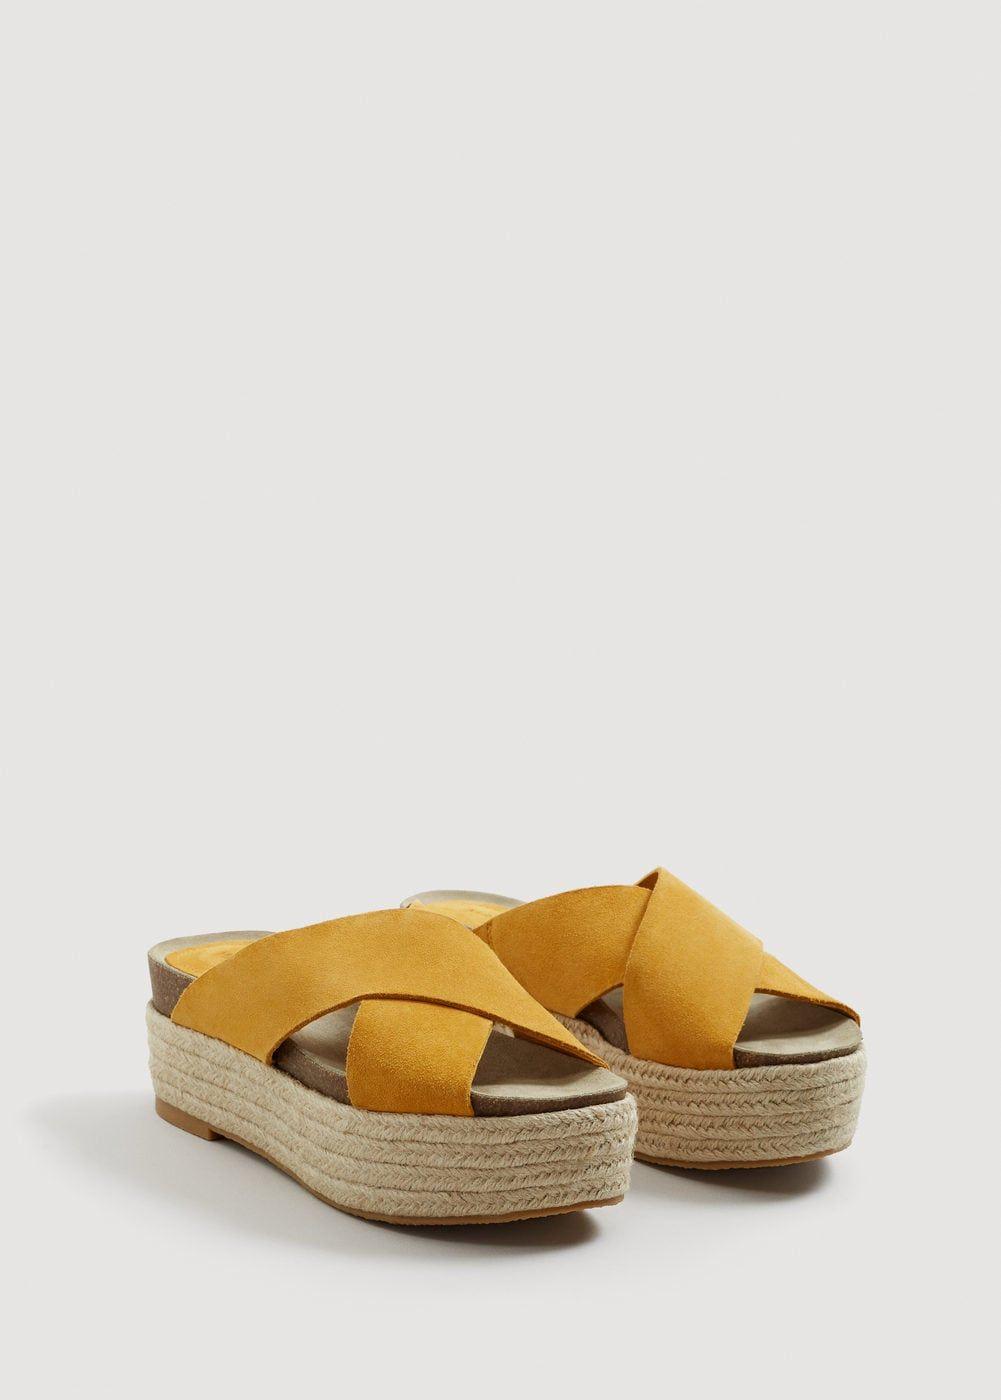 6721e10c1ca Platform leather sandals - Women in 2019 | It's Spring 2019 ...